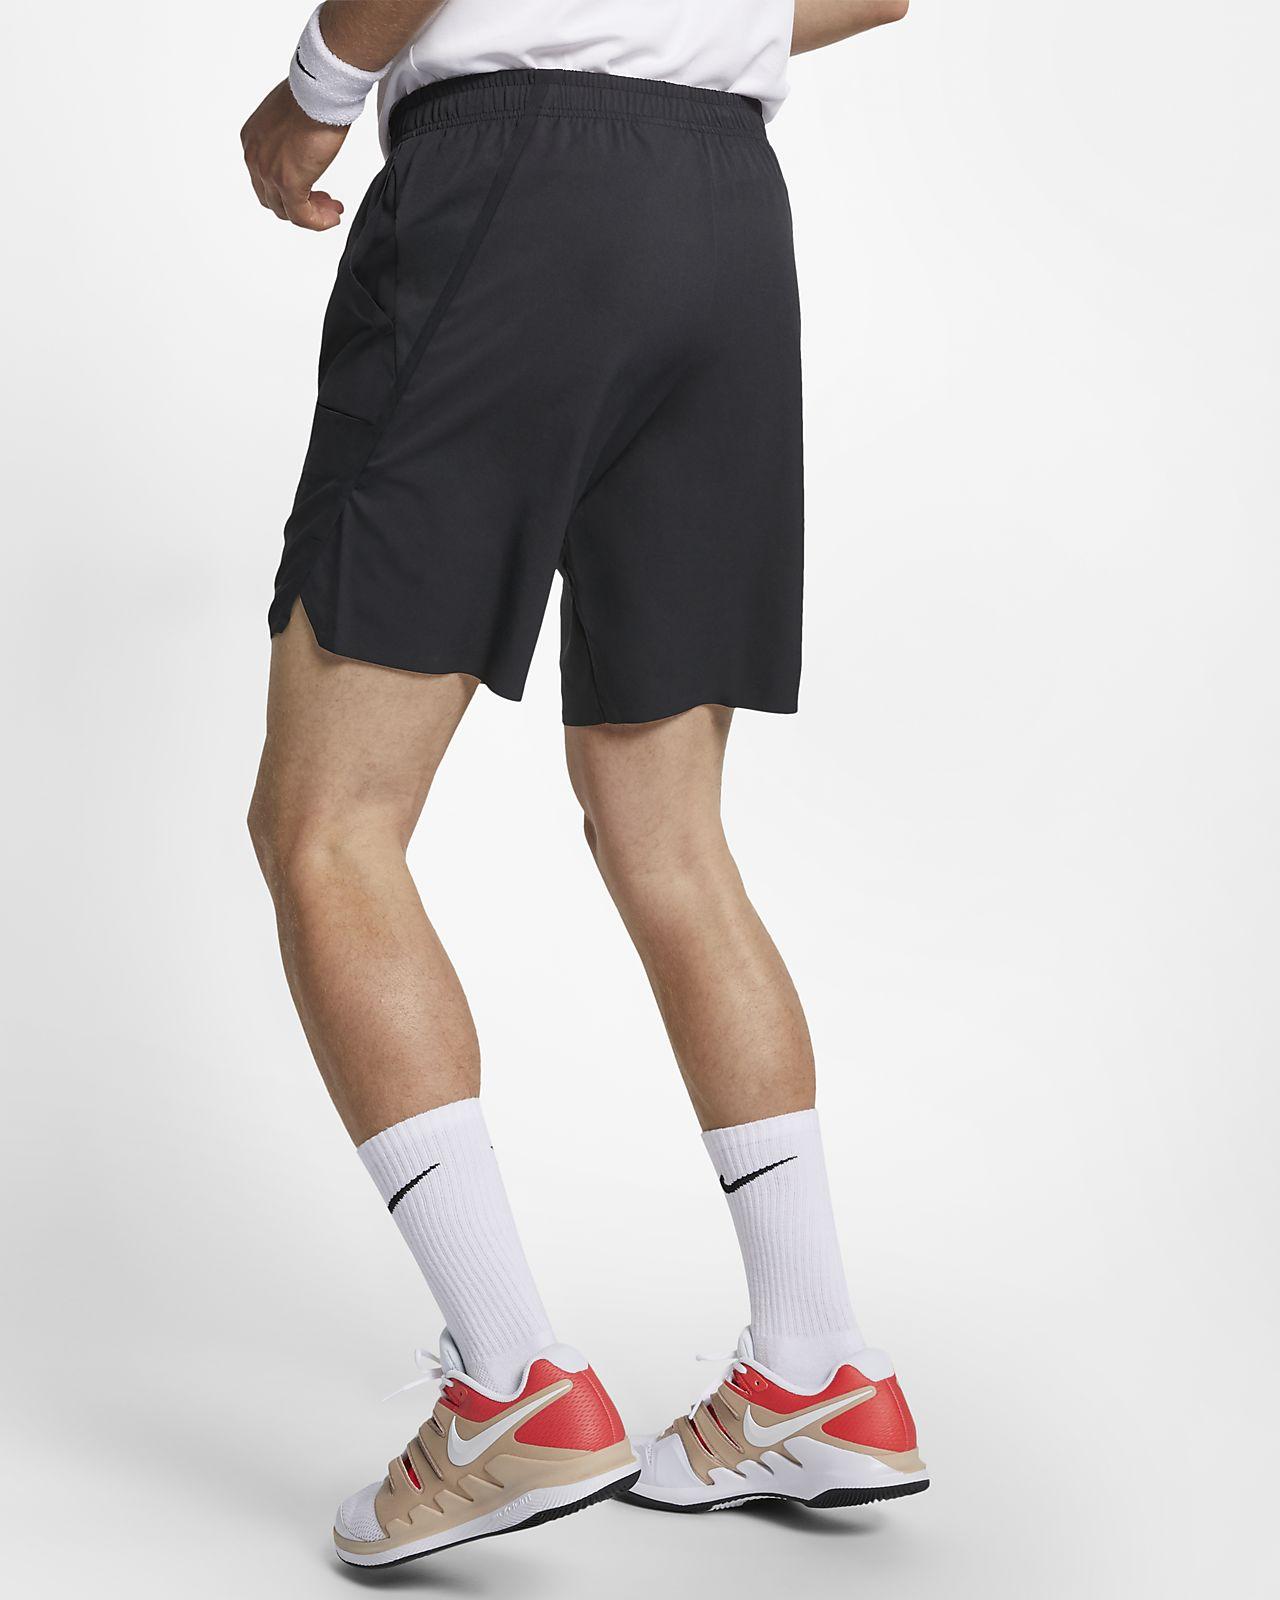 e2bf458b566 NikeCourt Flex Ace Tennisshorts van 23 cm voor heren. Nike.com NL